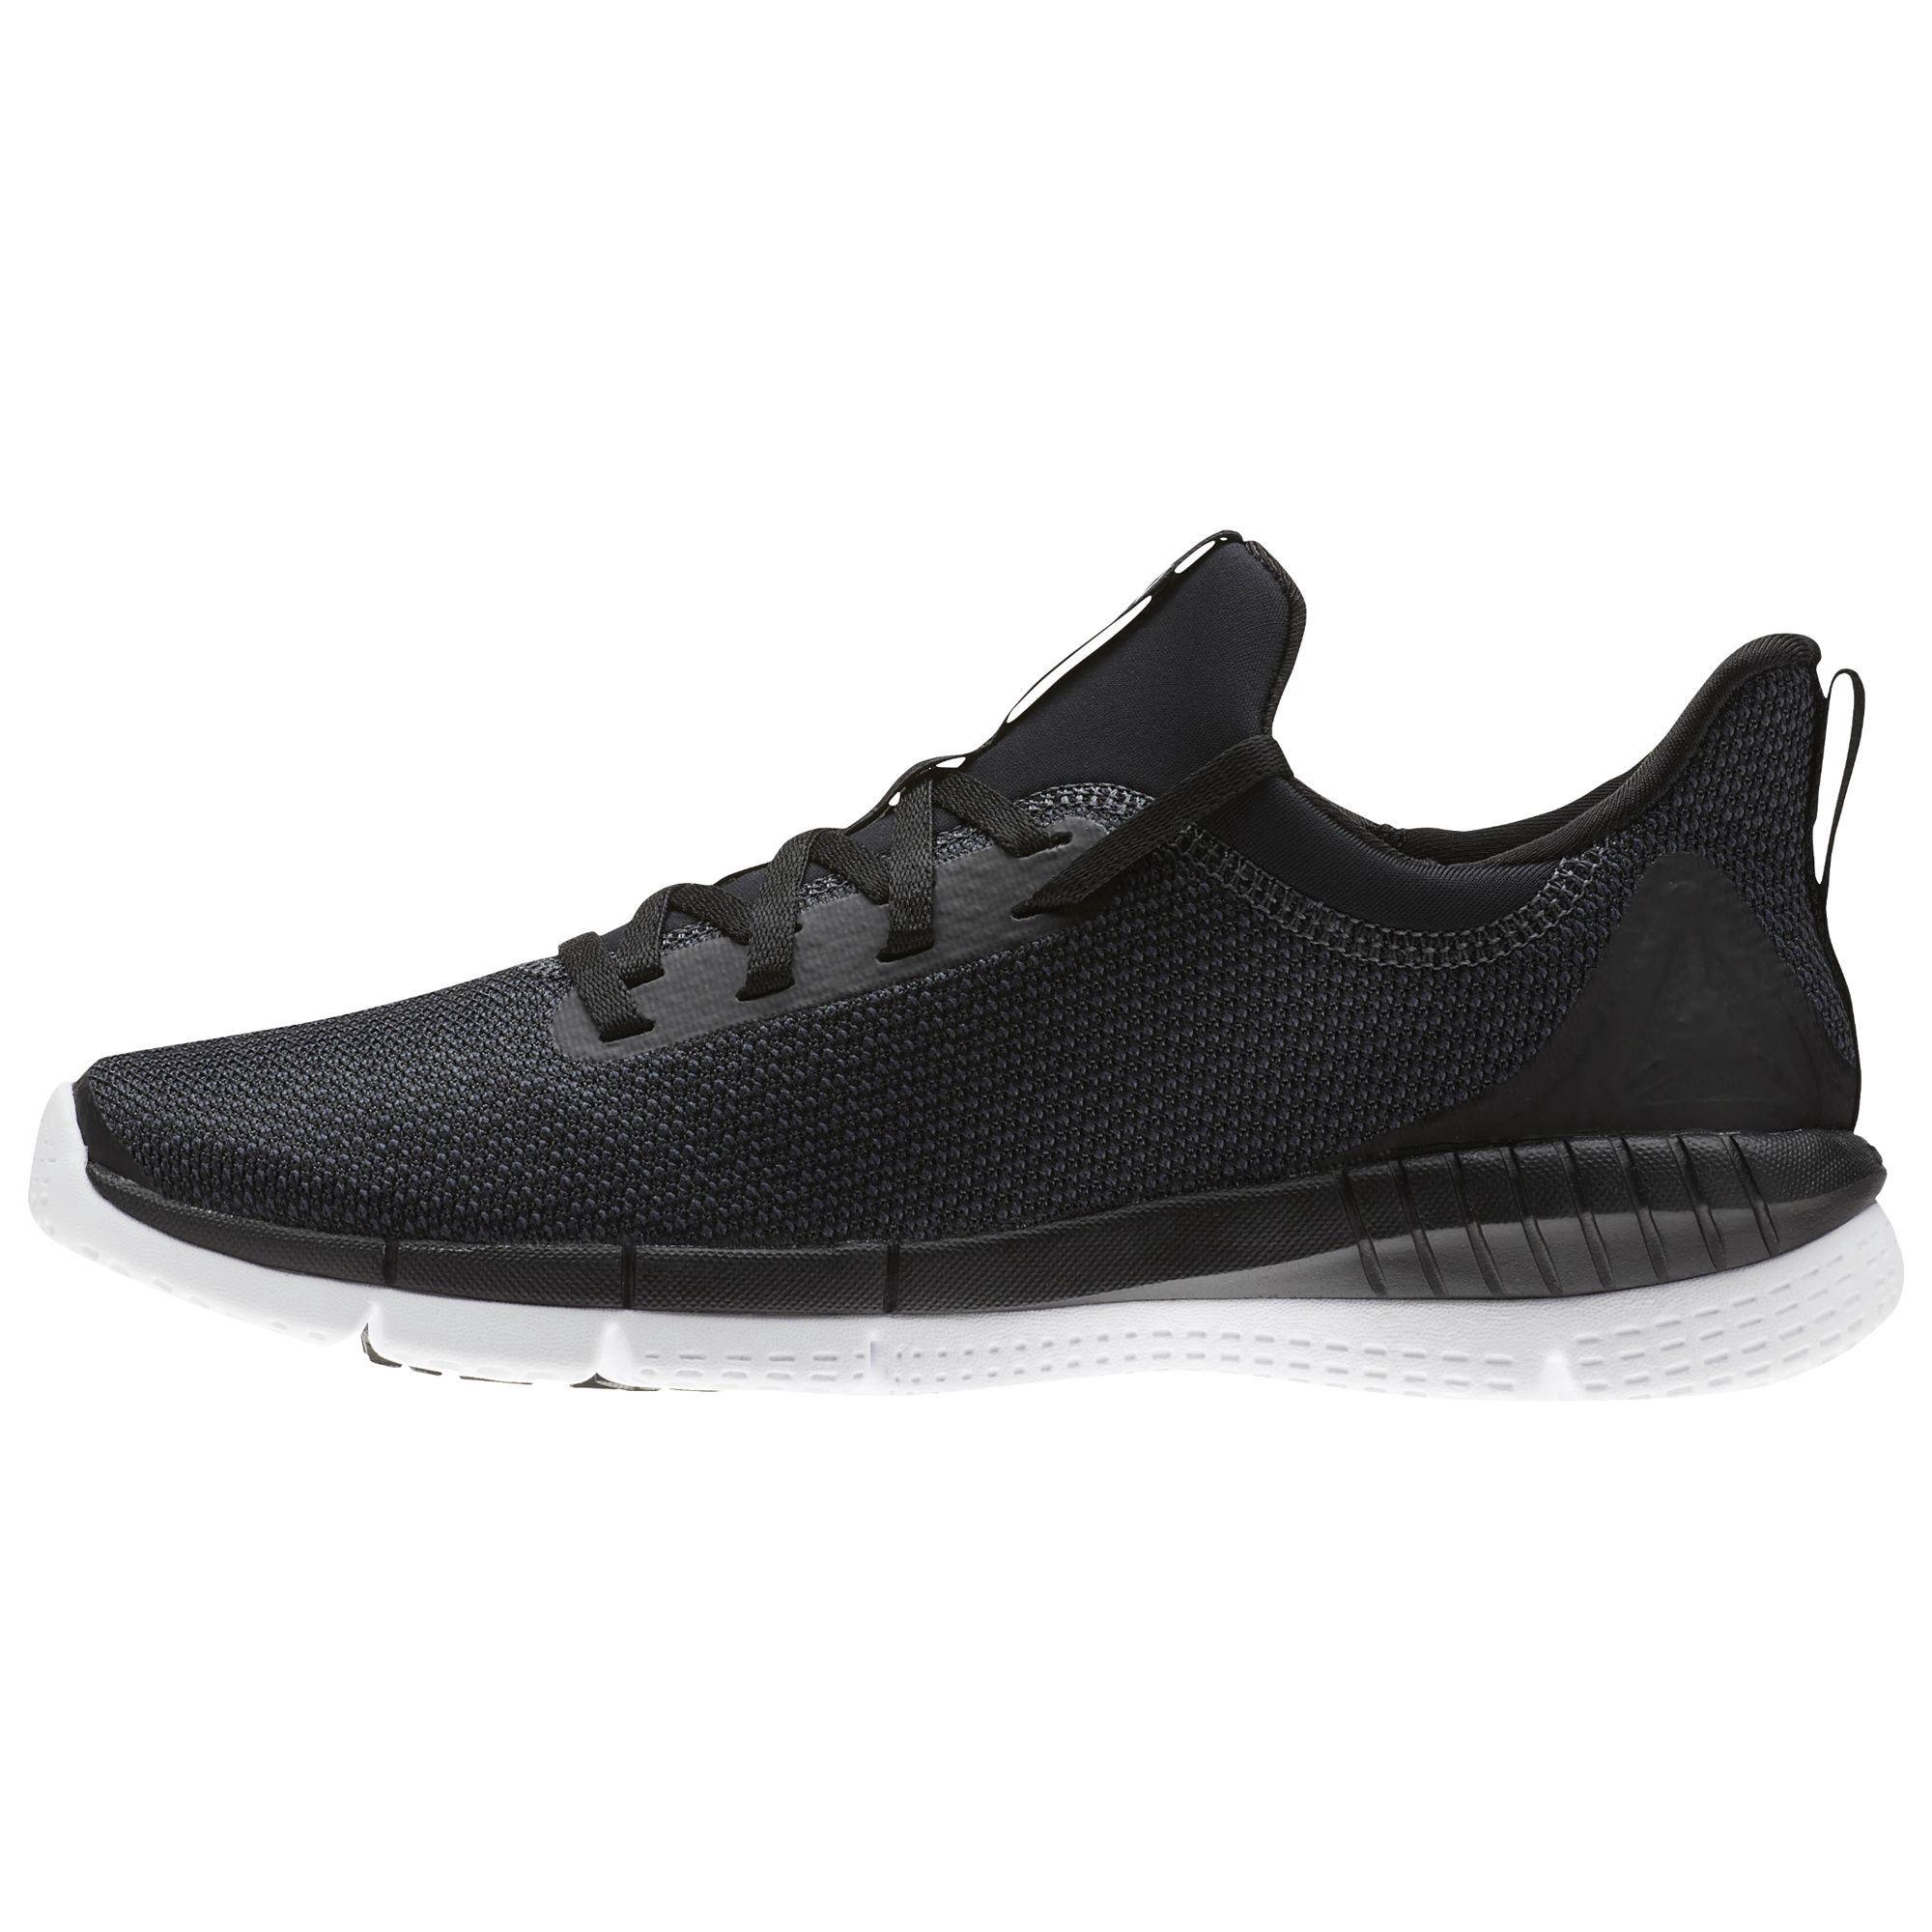 asics comutora women's running shoes espa�a